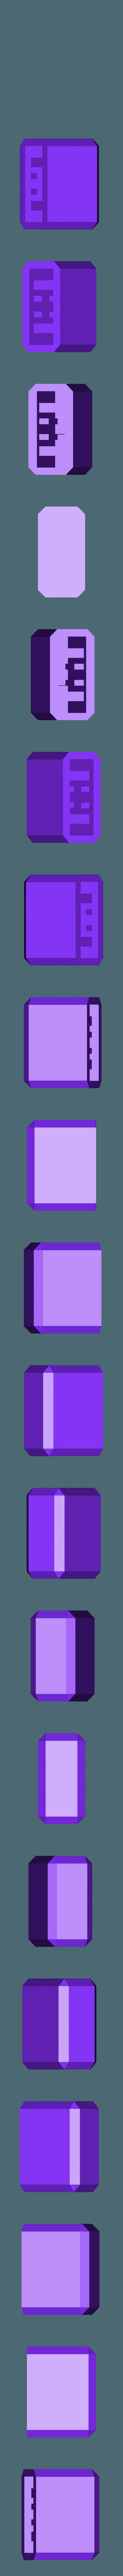 Tapón MUSB.stl Download free STL file Otg flash drive case • 3D print template, Loren